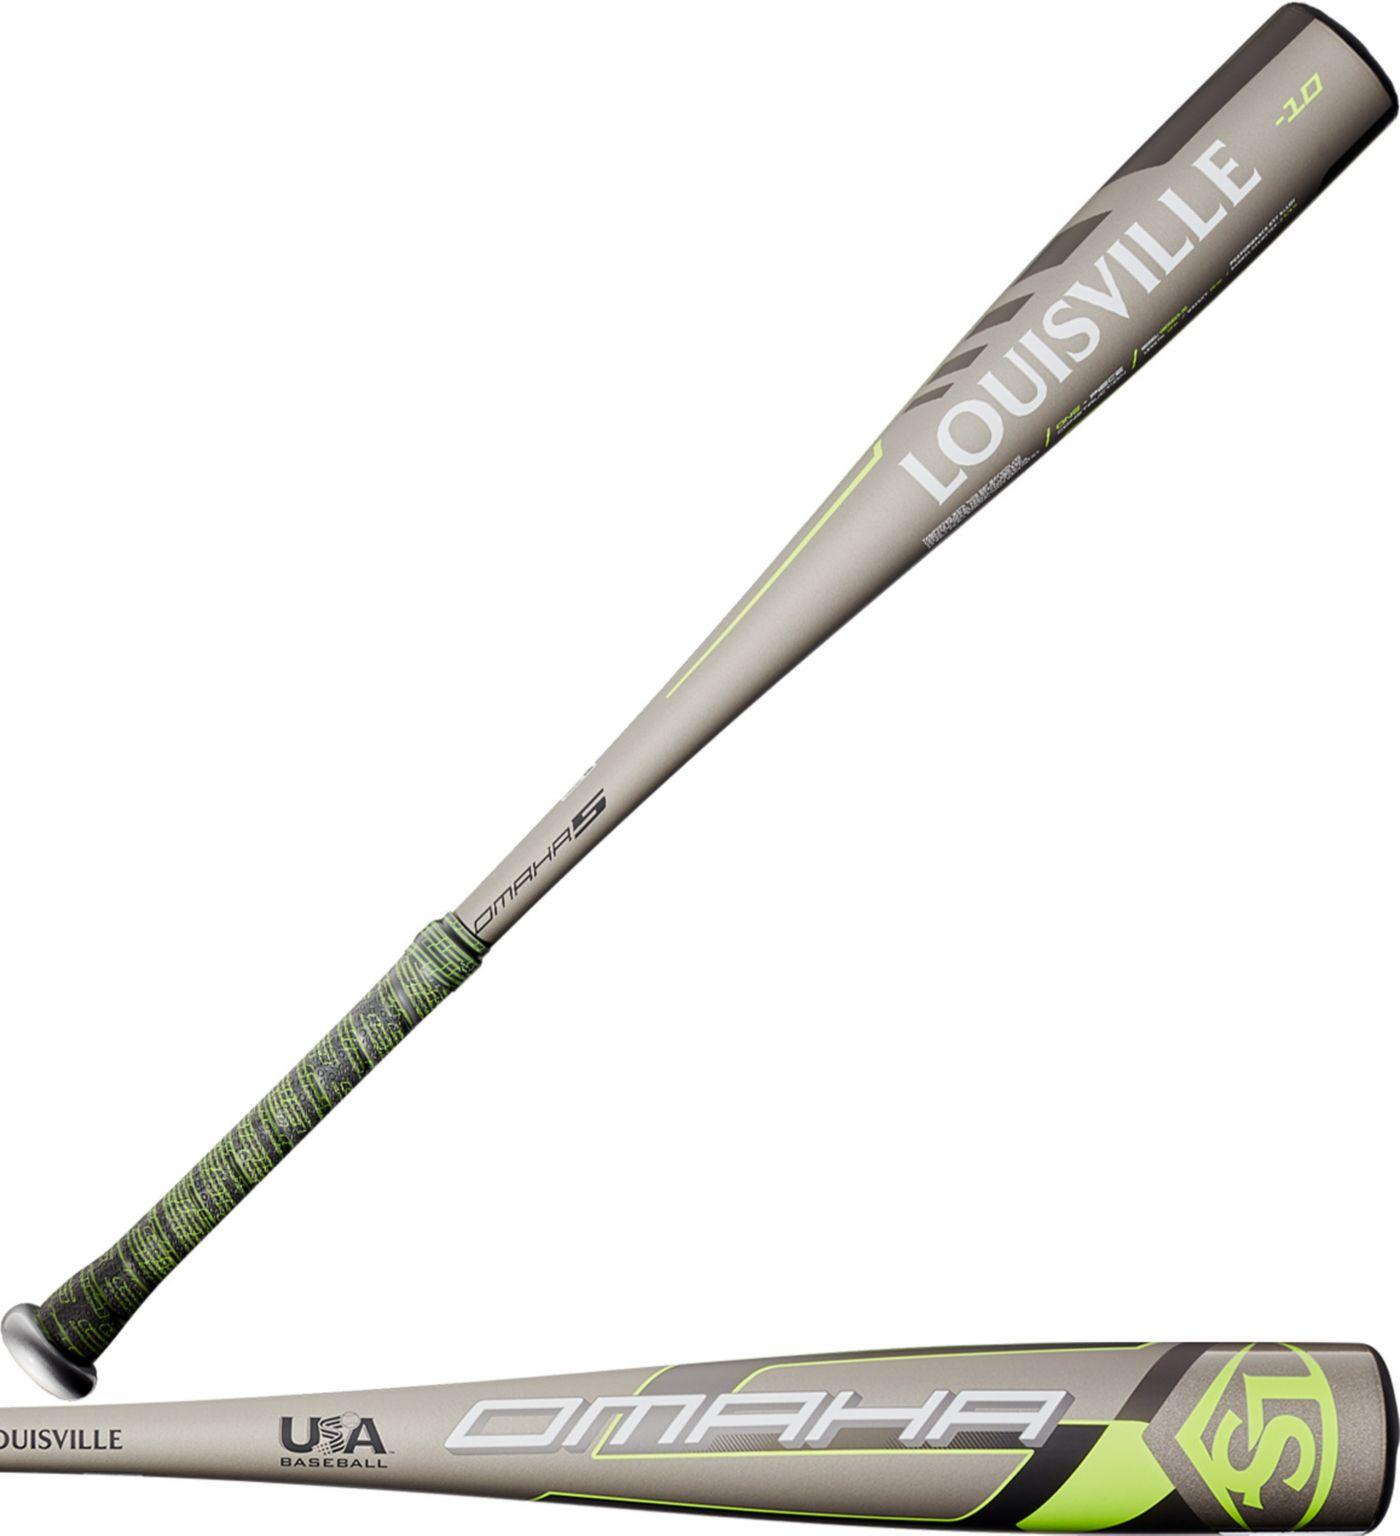 Louisville Slugger Omaha USA Youth Bat 2020 (-10)